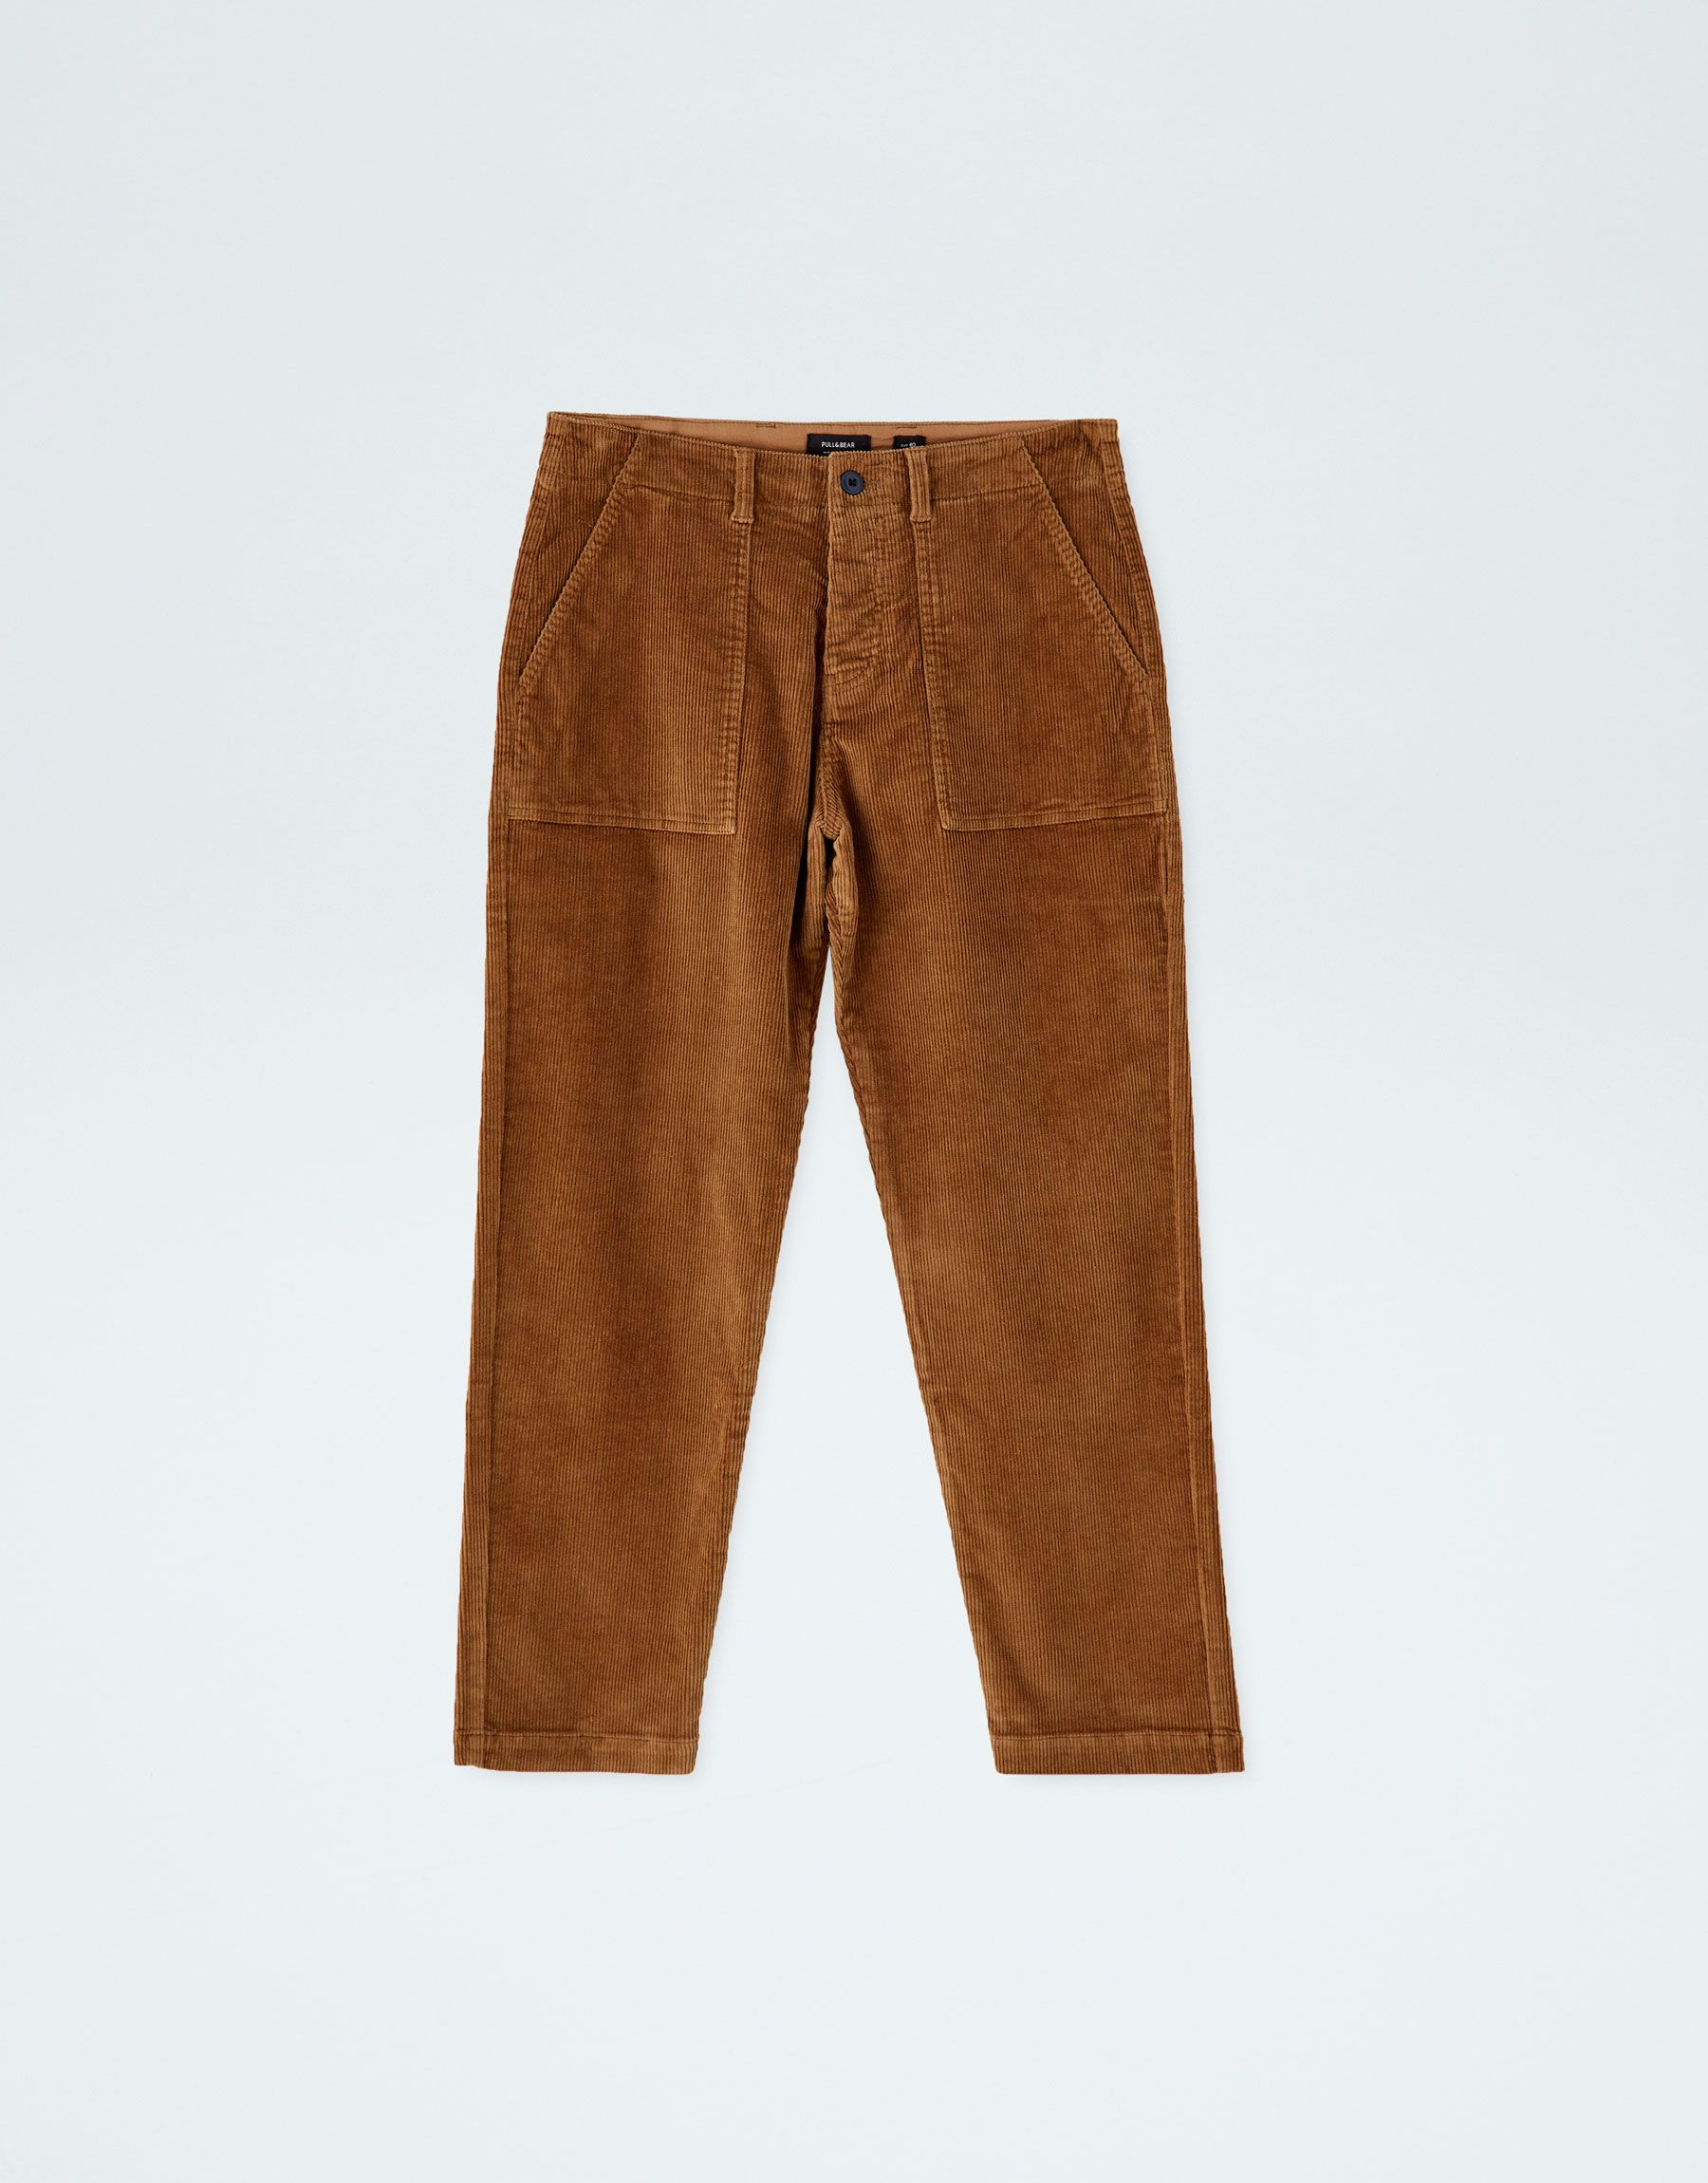 Pantalon Pana Worker Pull Bear Pantalon Pana Hombre Pantalones De Pana Ropa